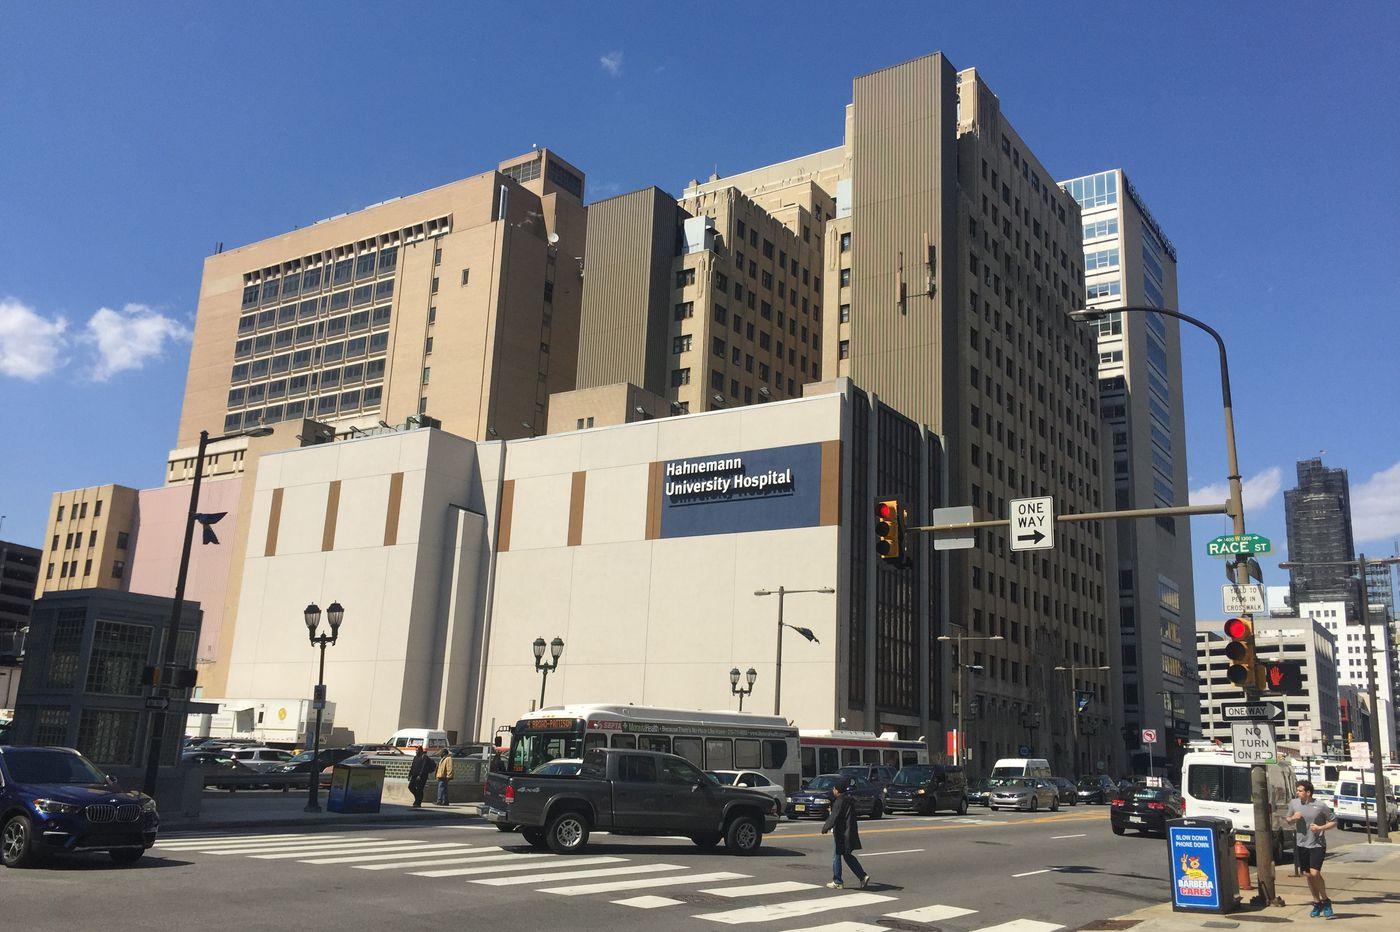 Hahnemann University Hospital announces 175 layoffs. CEO describes shaky financial condition